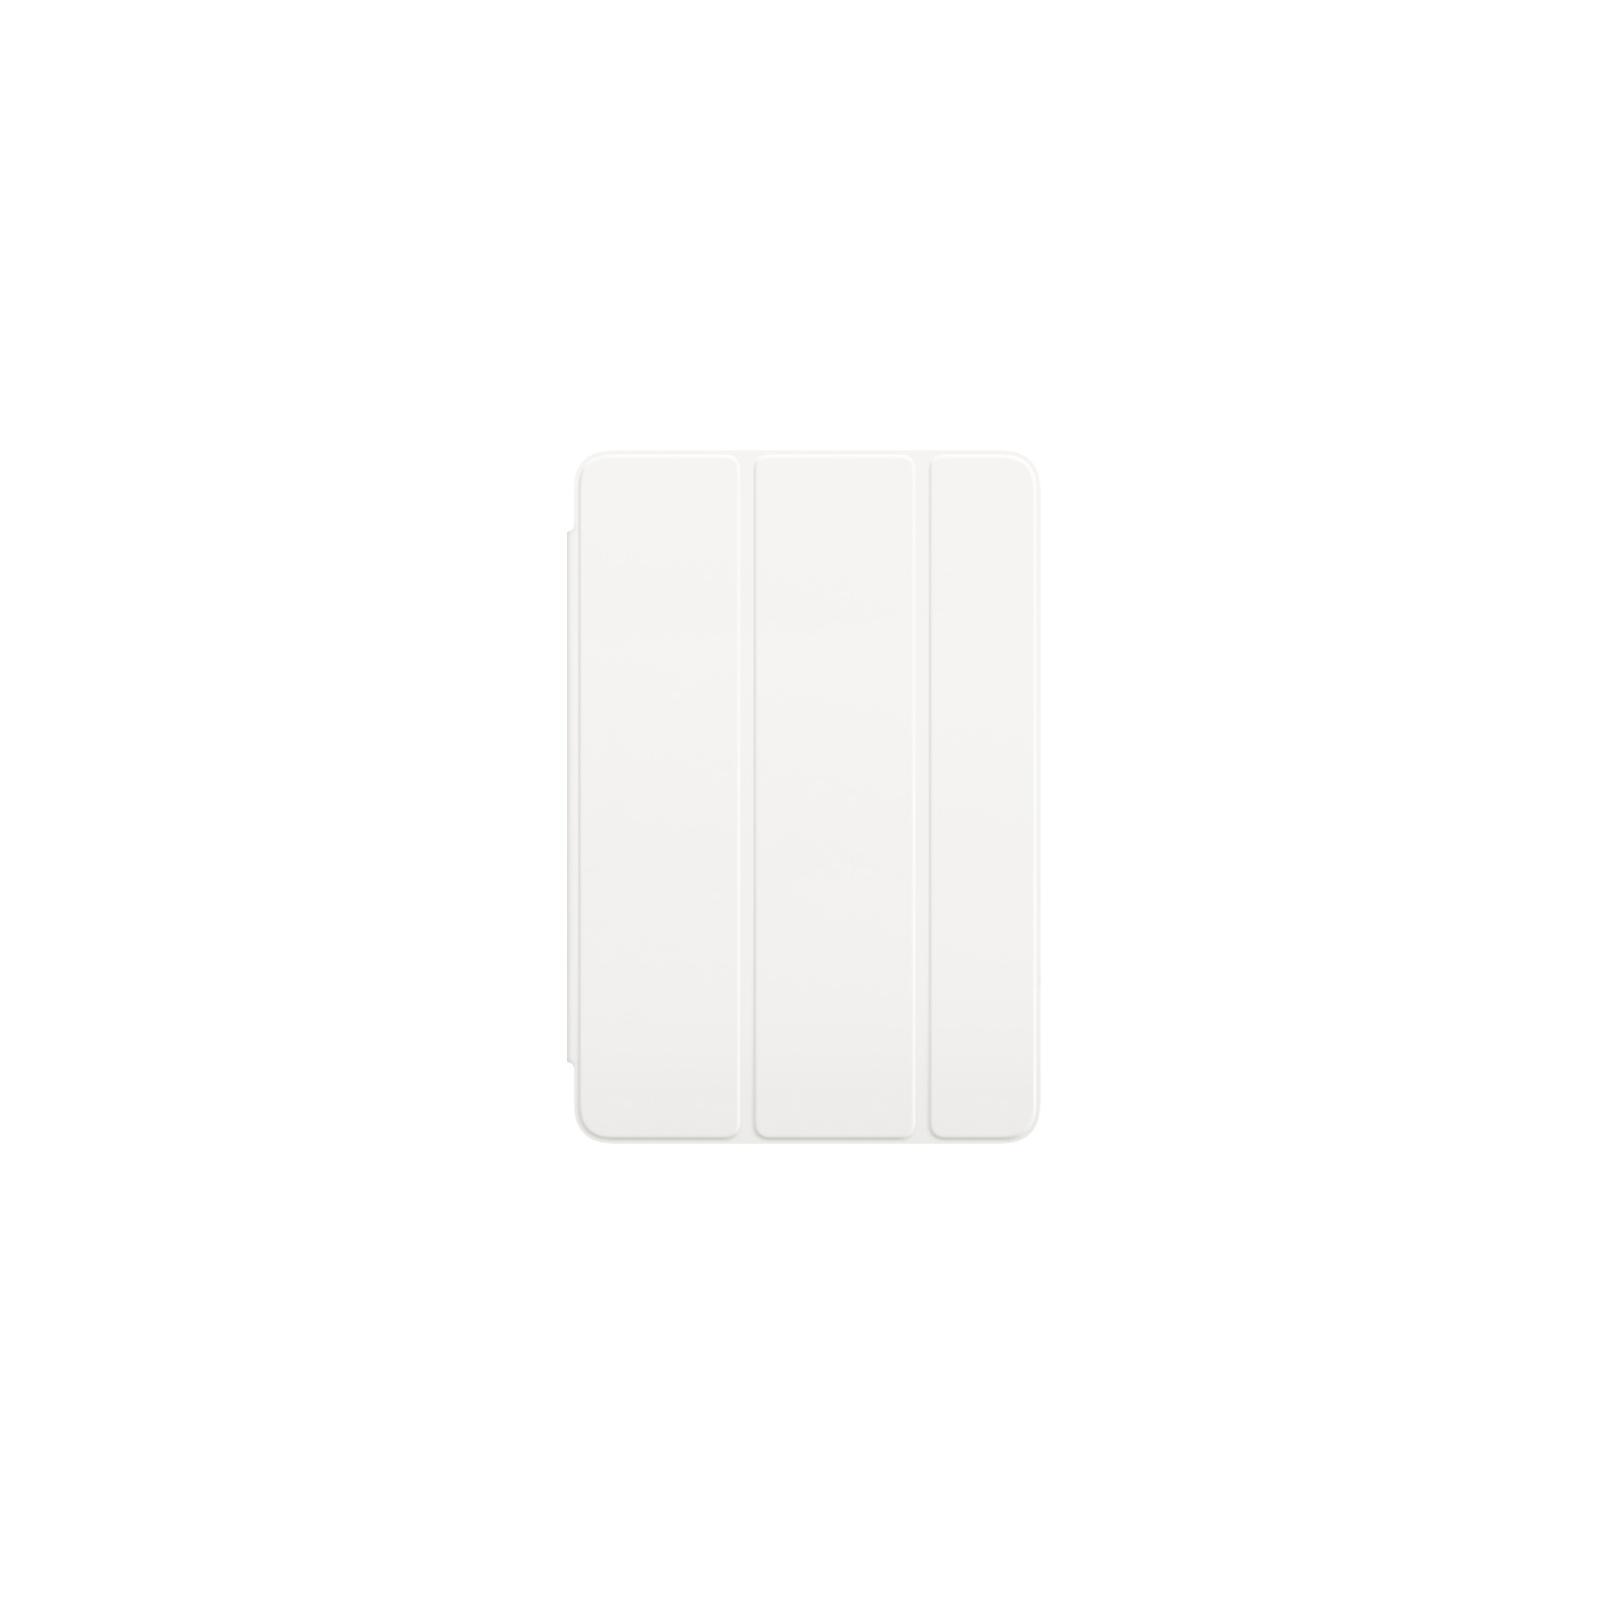 Чехол для планшета Apple Smart Cover для iPad mini 4 White (MKLW2ZM/A)